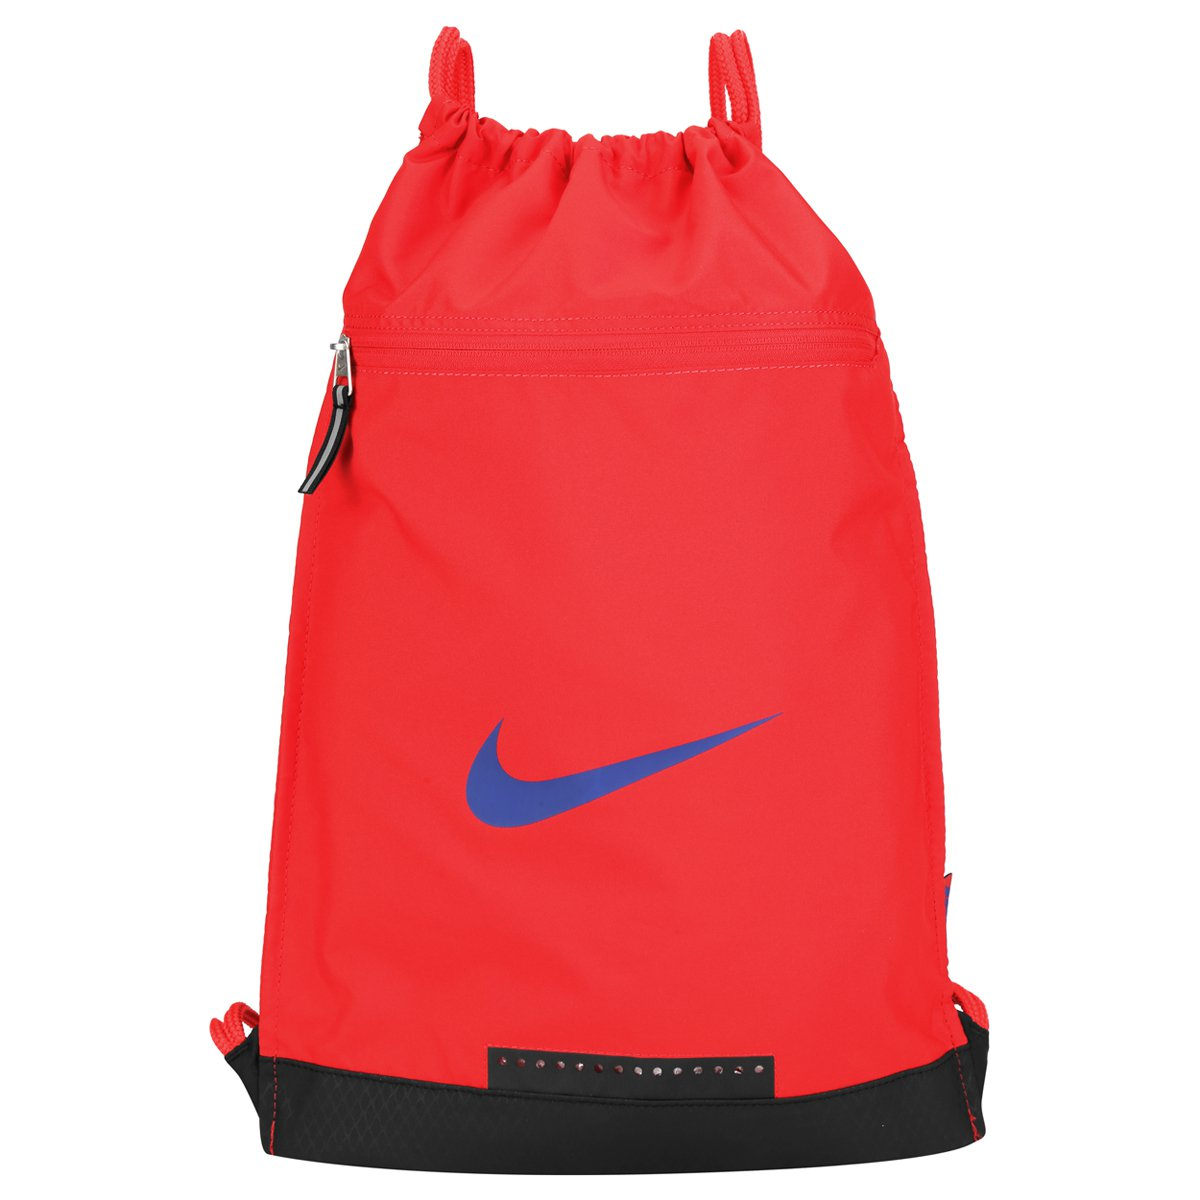 38f27d7ed Sacola Nike Team Training DS - Compre Agora | Netshoes